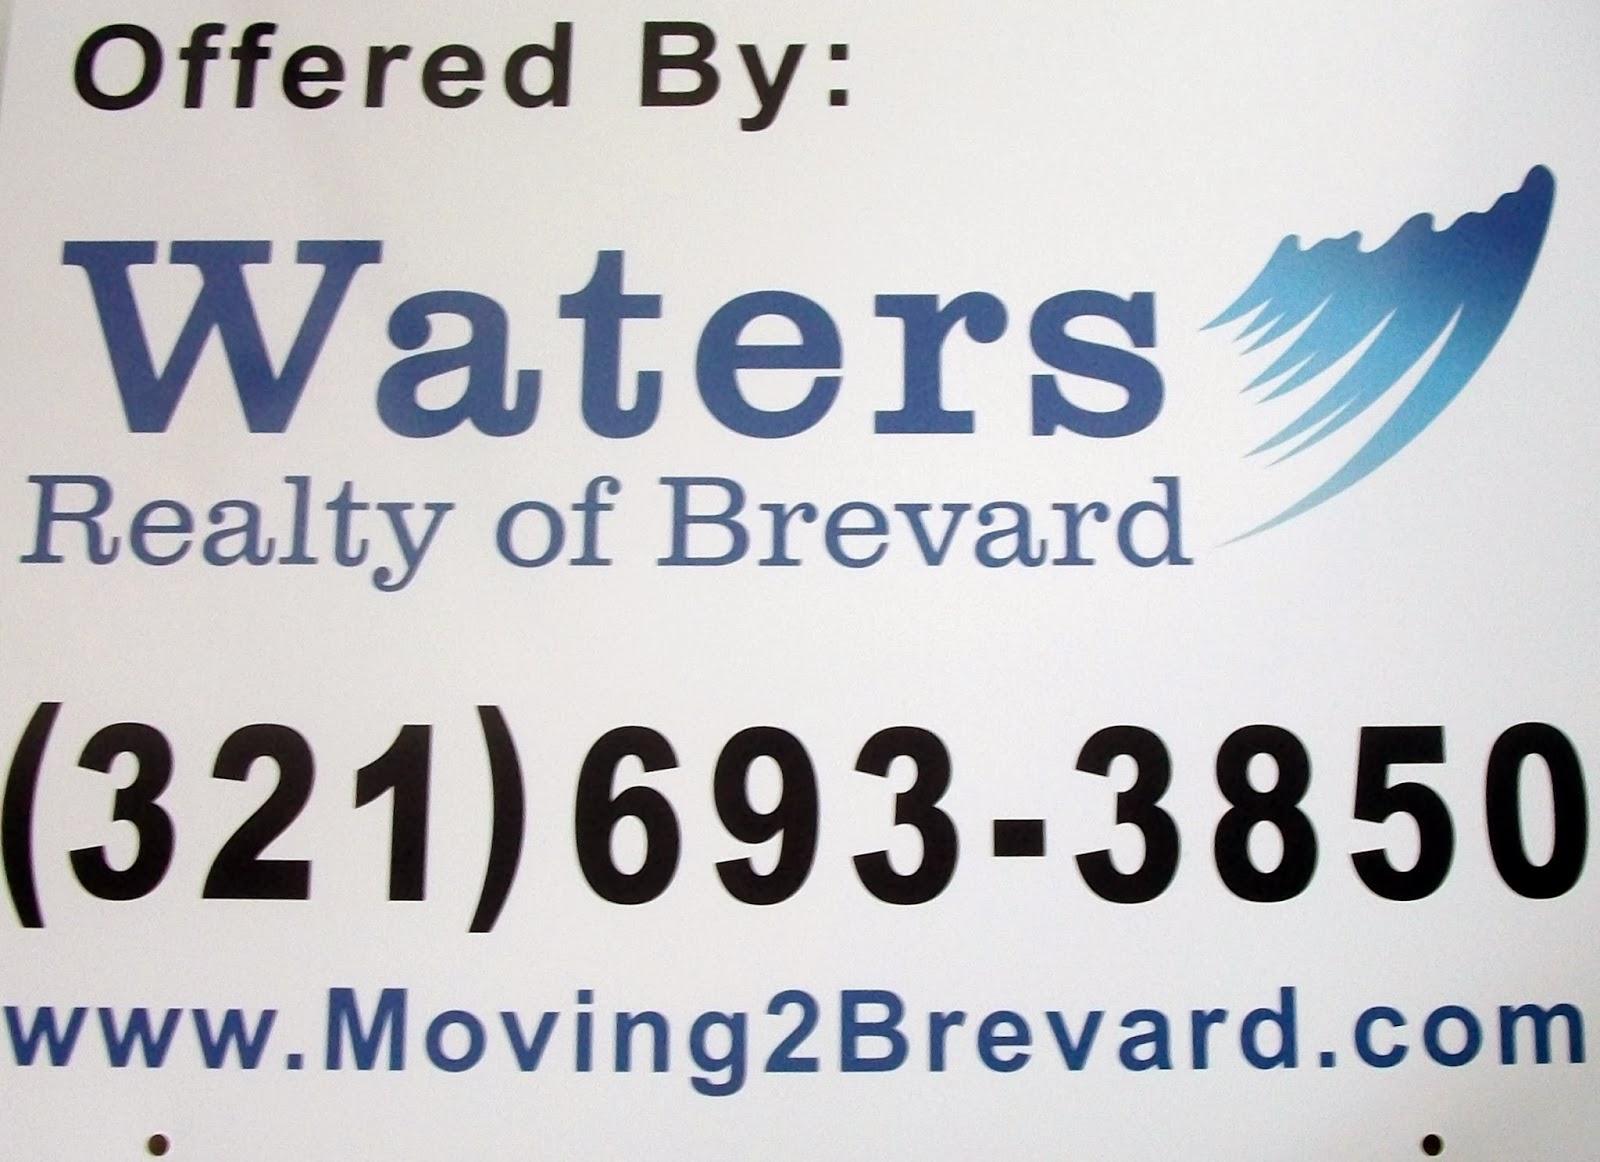 www.moving2brevard.com